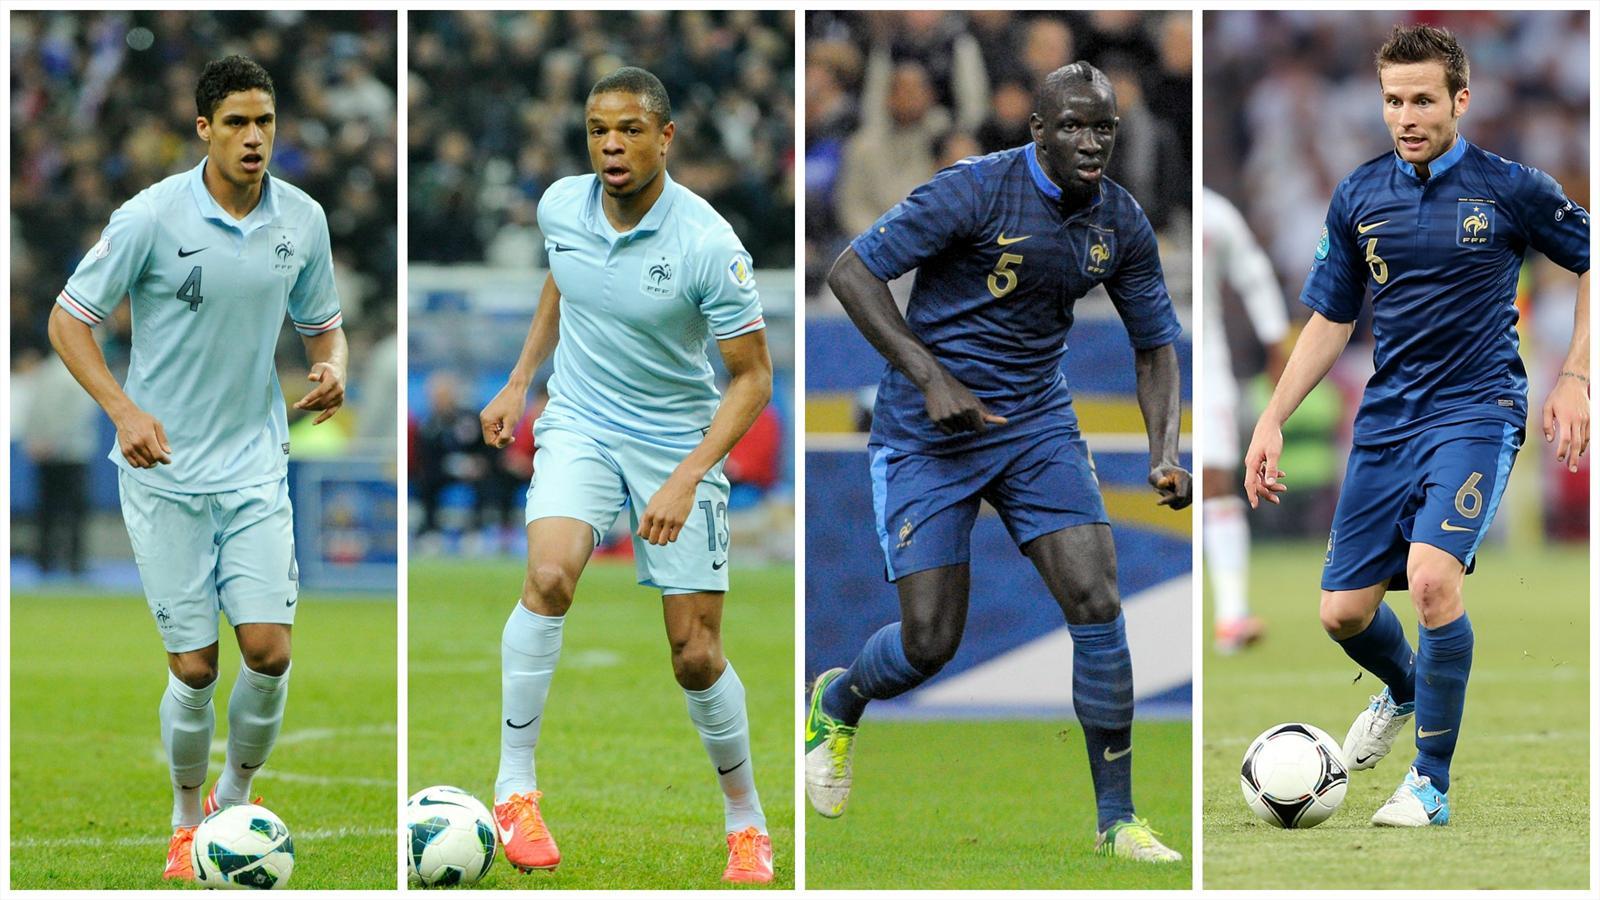 Bleus mamadou sakho rapha l varane yohan cabaye et - Qualification coupe du monde resultat ...